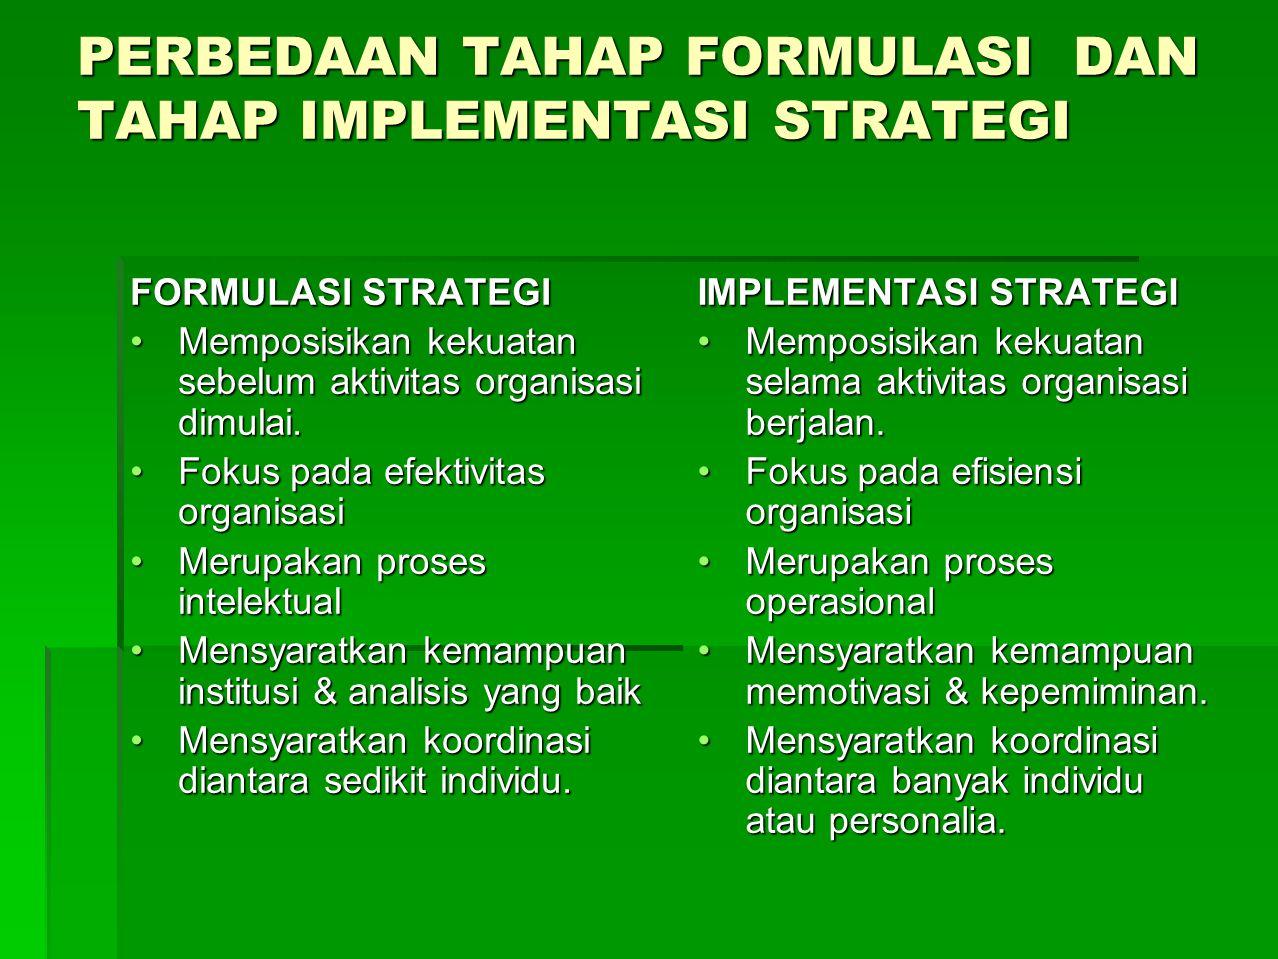 FAKTOR KUNCI KEBERHASILAN IMPLEMENTASI STRATEGI  Budaya organisasi  Struktur organisasi  Sistem organisasi  Pemberian penghargaan  Strategi organisasi